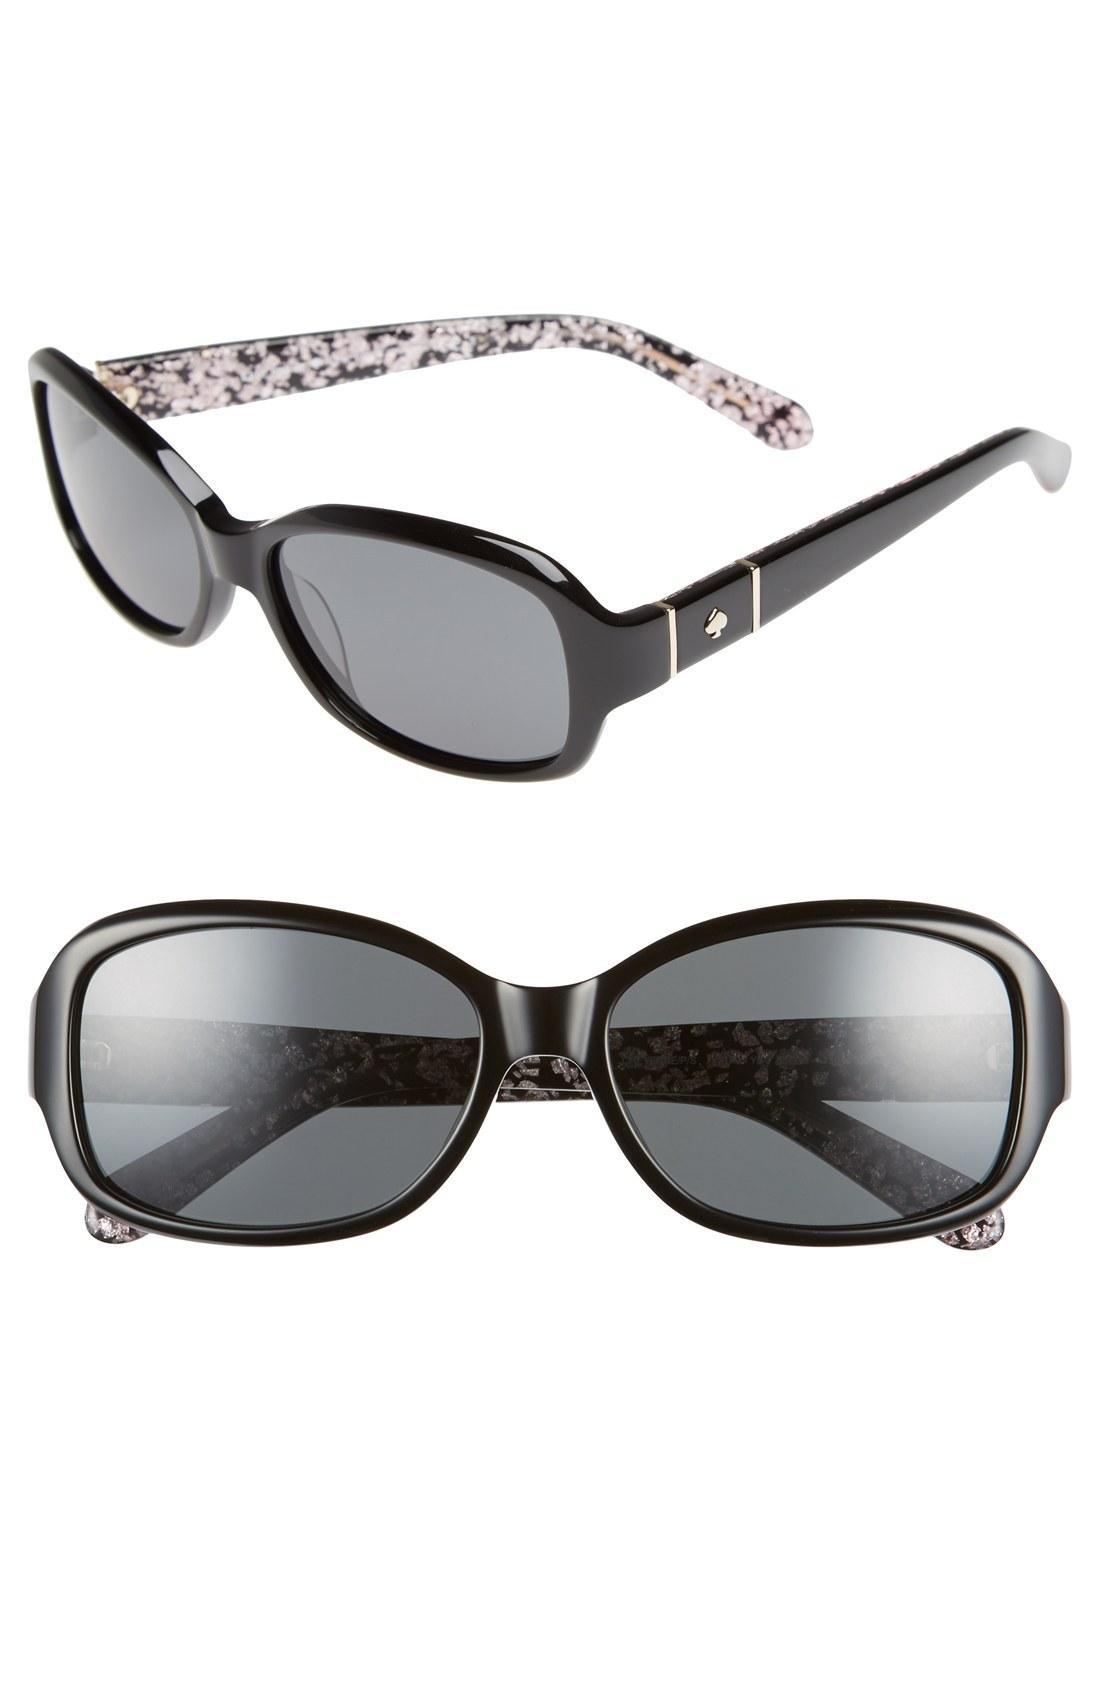 8c327e79ba6e8 Kate Spade Cheyenne P S 55Mm Polarized Sunglasses In Nocolor